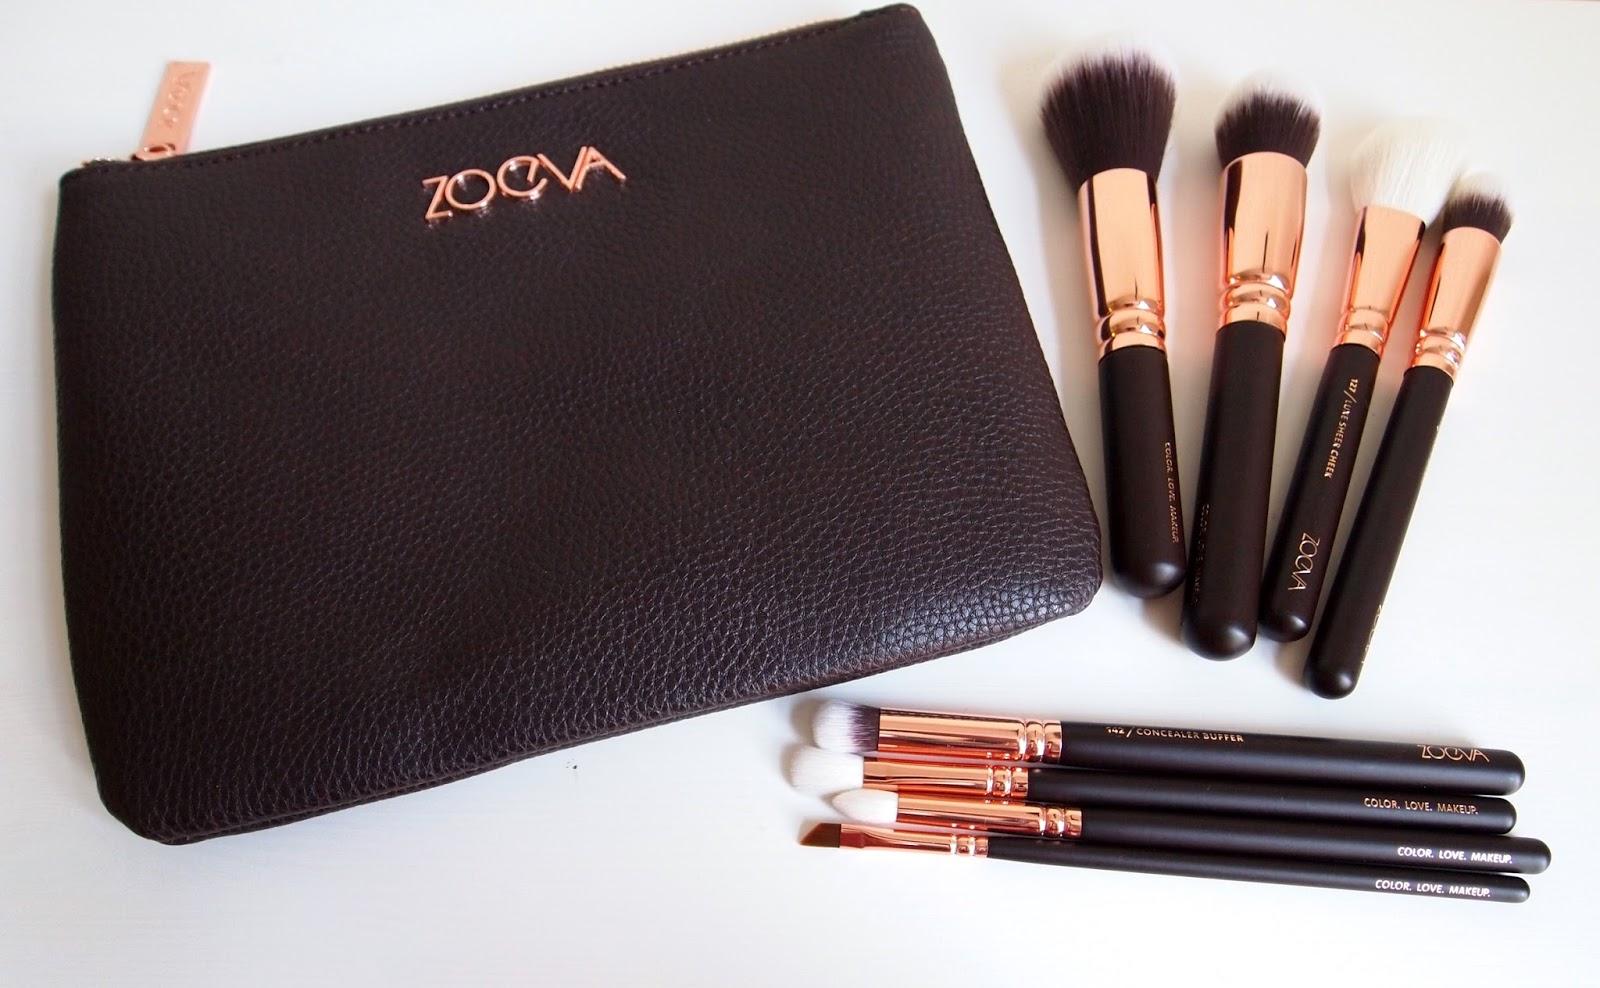 Zoeva Rose Gold Luxury Set